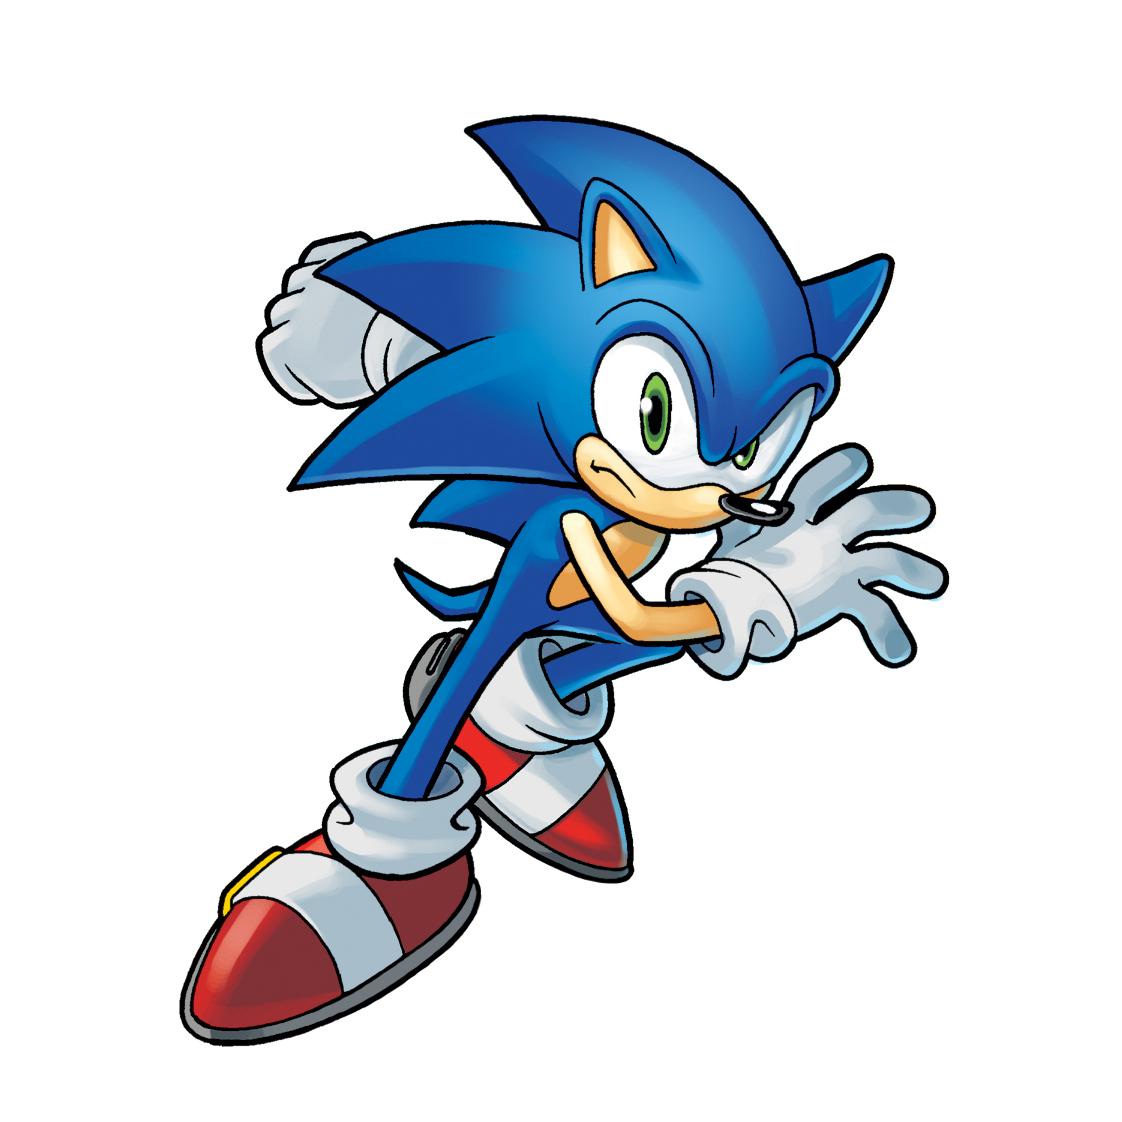 sonic the hedgehog - photo #42